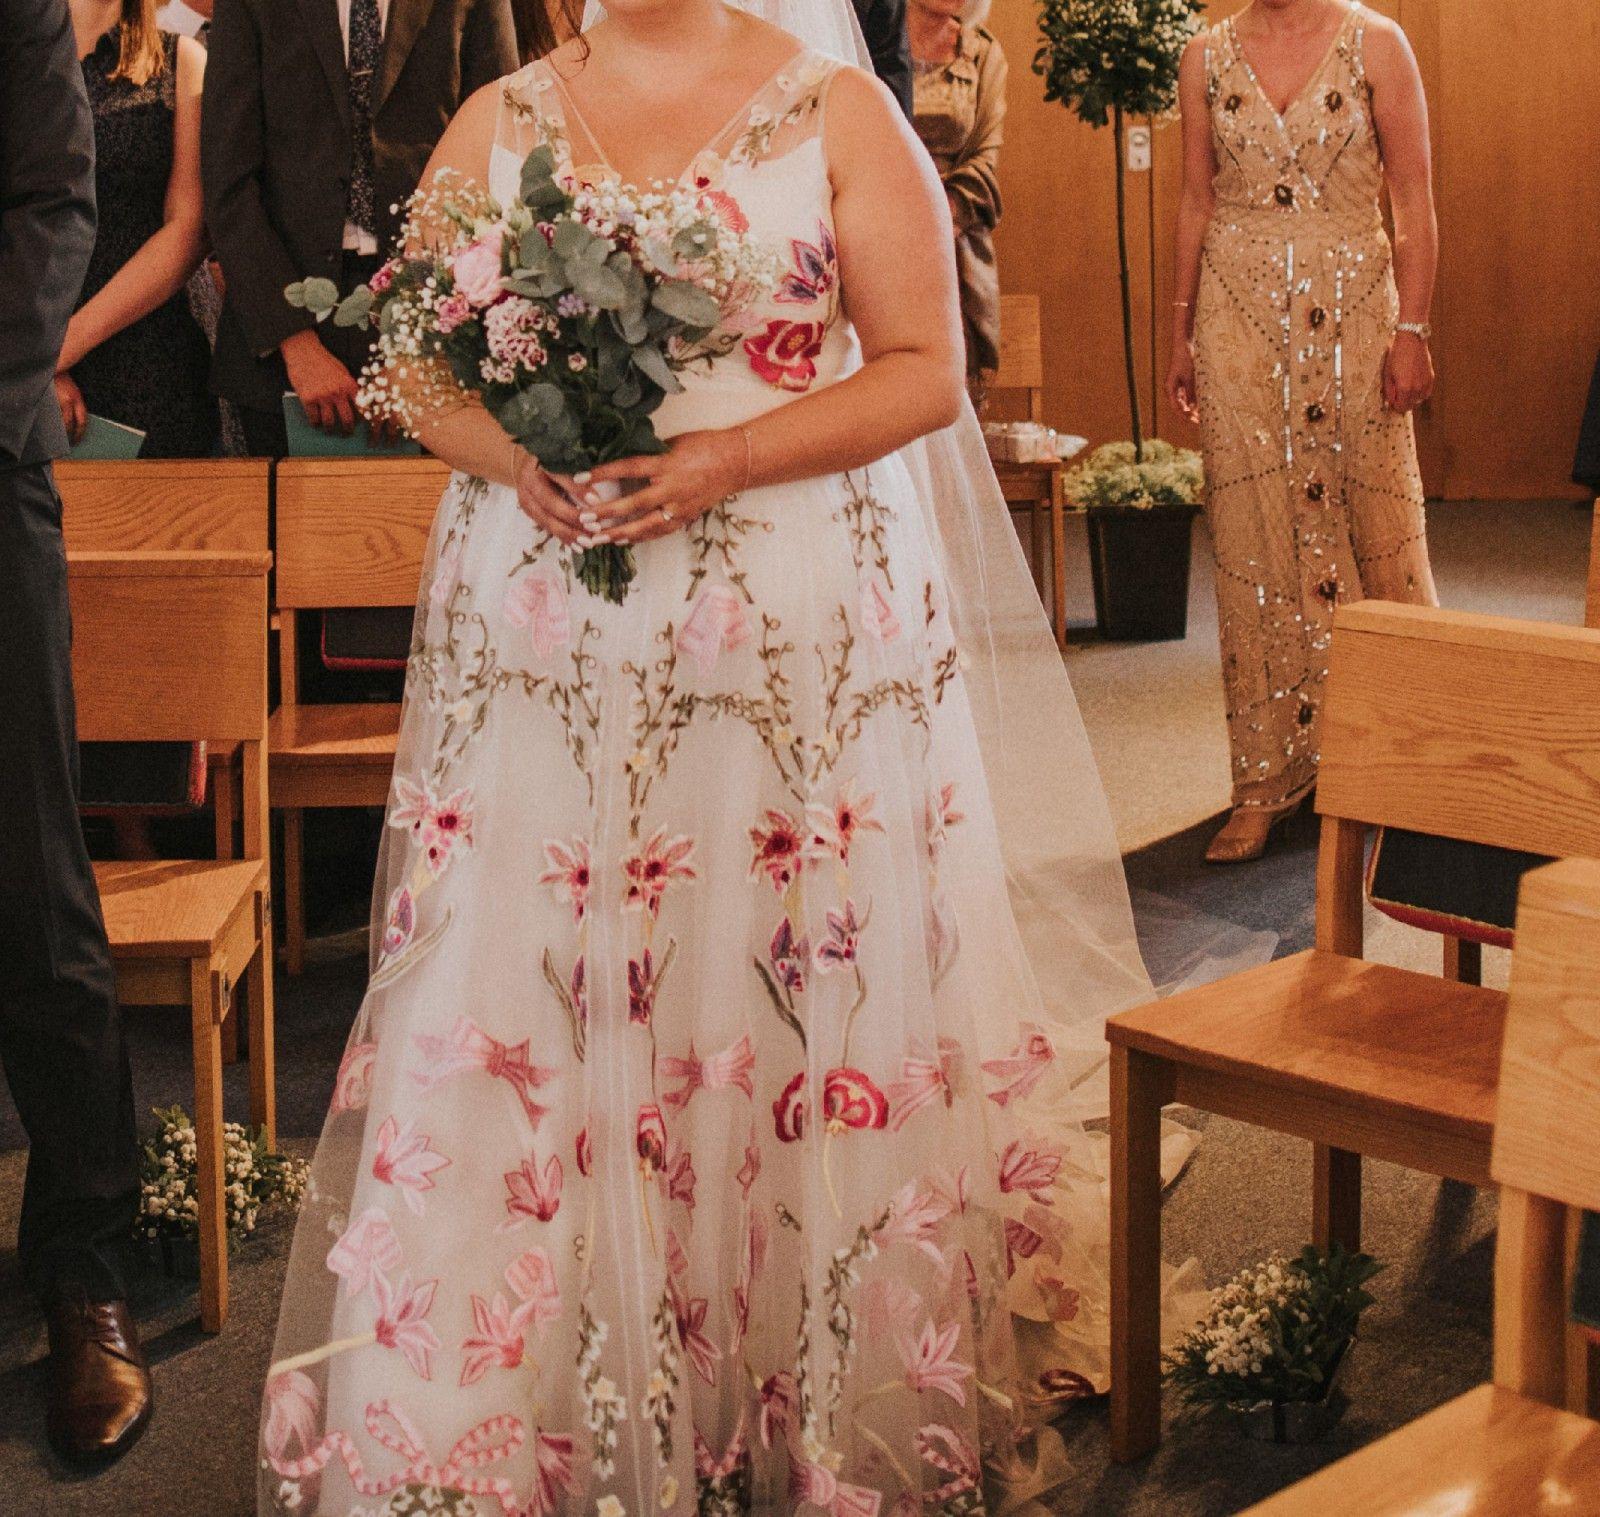 422757fb947c Temperley London Bibi Wedding Dress in 2019 | Cough secret wedding ...